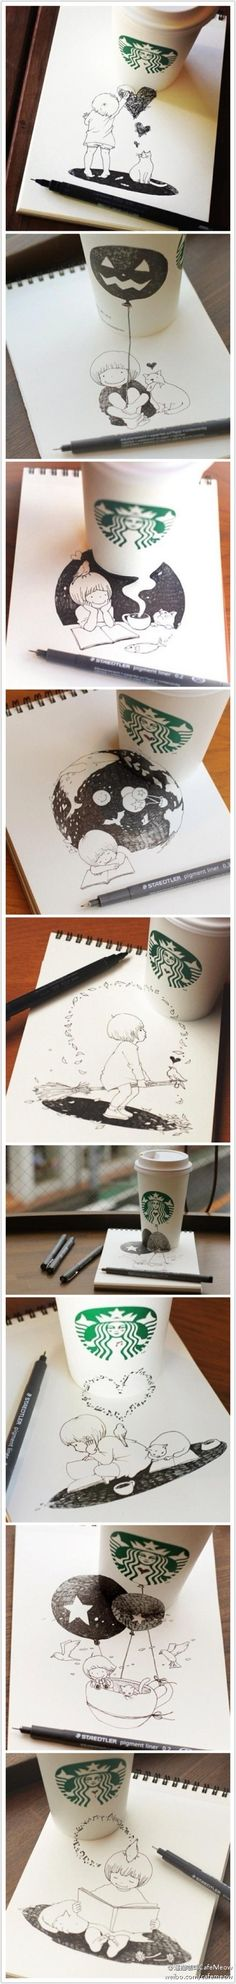 CafeMeow【猫插画】用星巴克杯画画~来自日本的Tomoko Shintani将喝完的咖啡纸杯与纸张结合在一起绘出互动的可爱插画,坐在咖啡店也不用那么的放空,随手拿起笔,也可以娱乐一番~